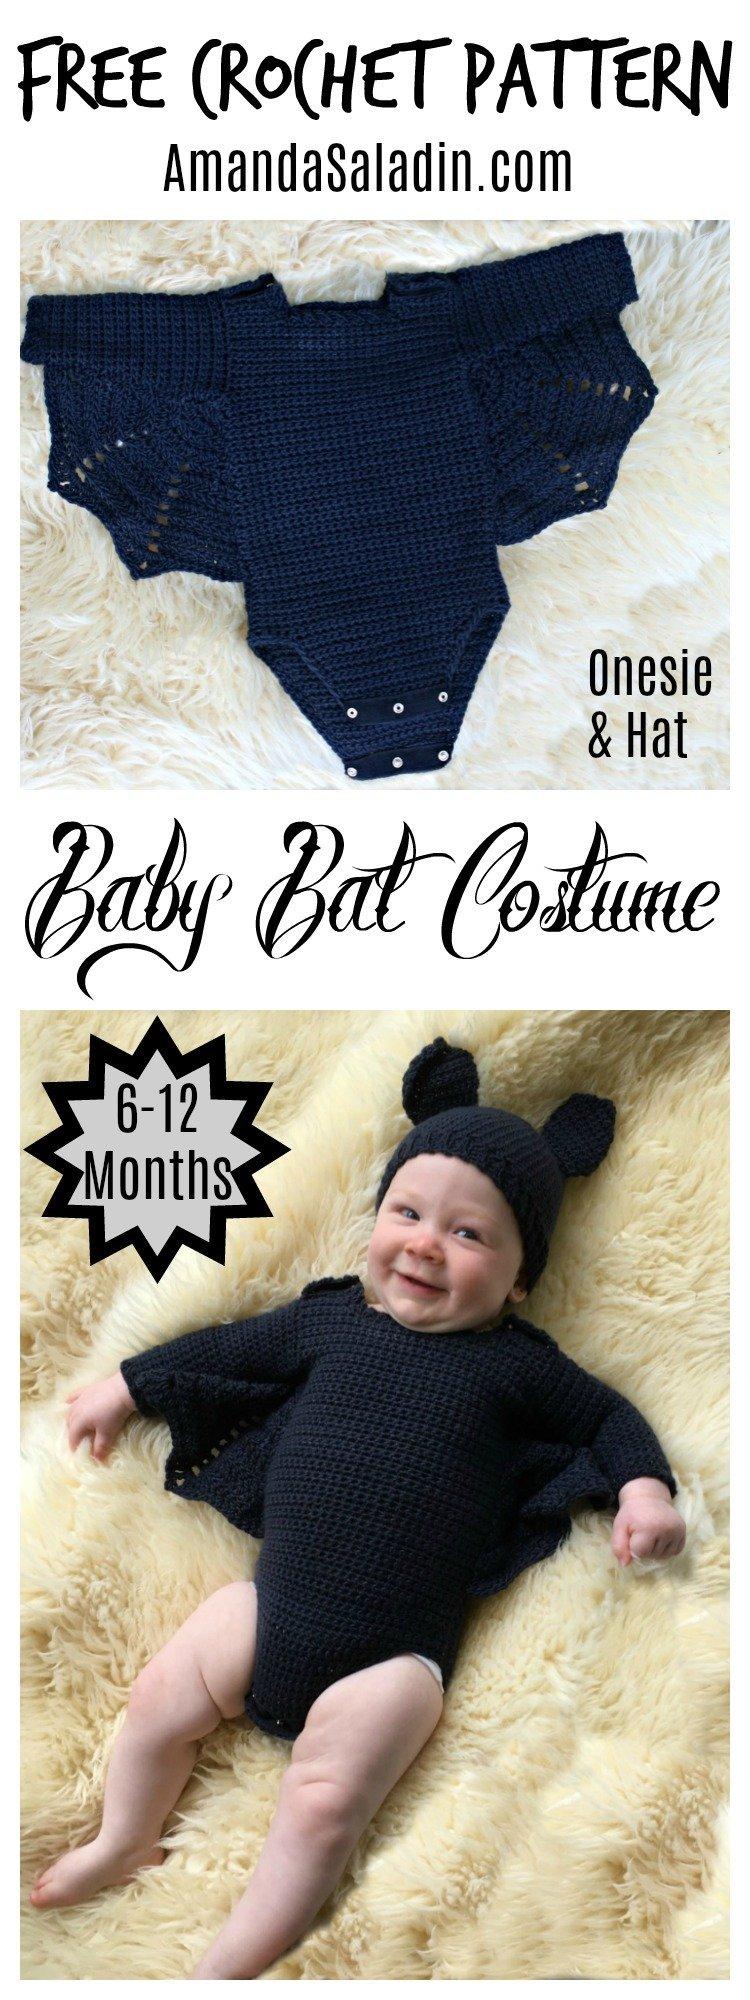 Baby Bat Costume Free Crochet Pattern Love Life Yarn